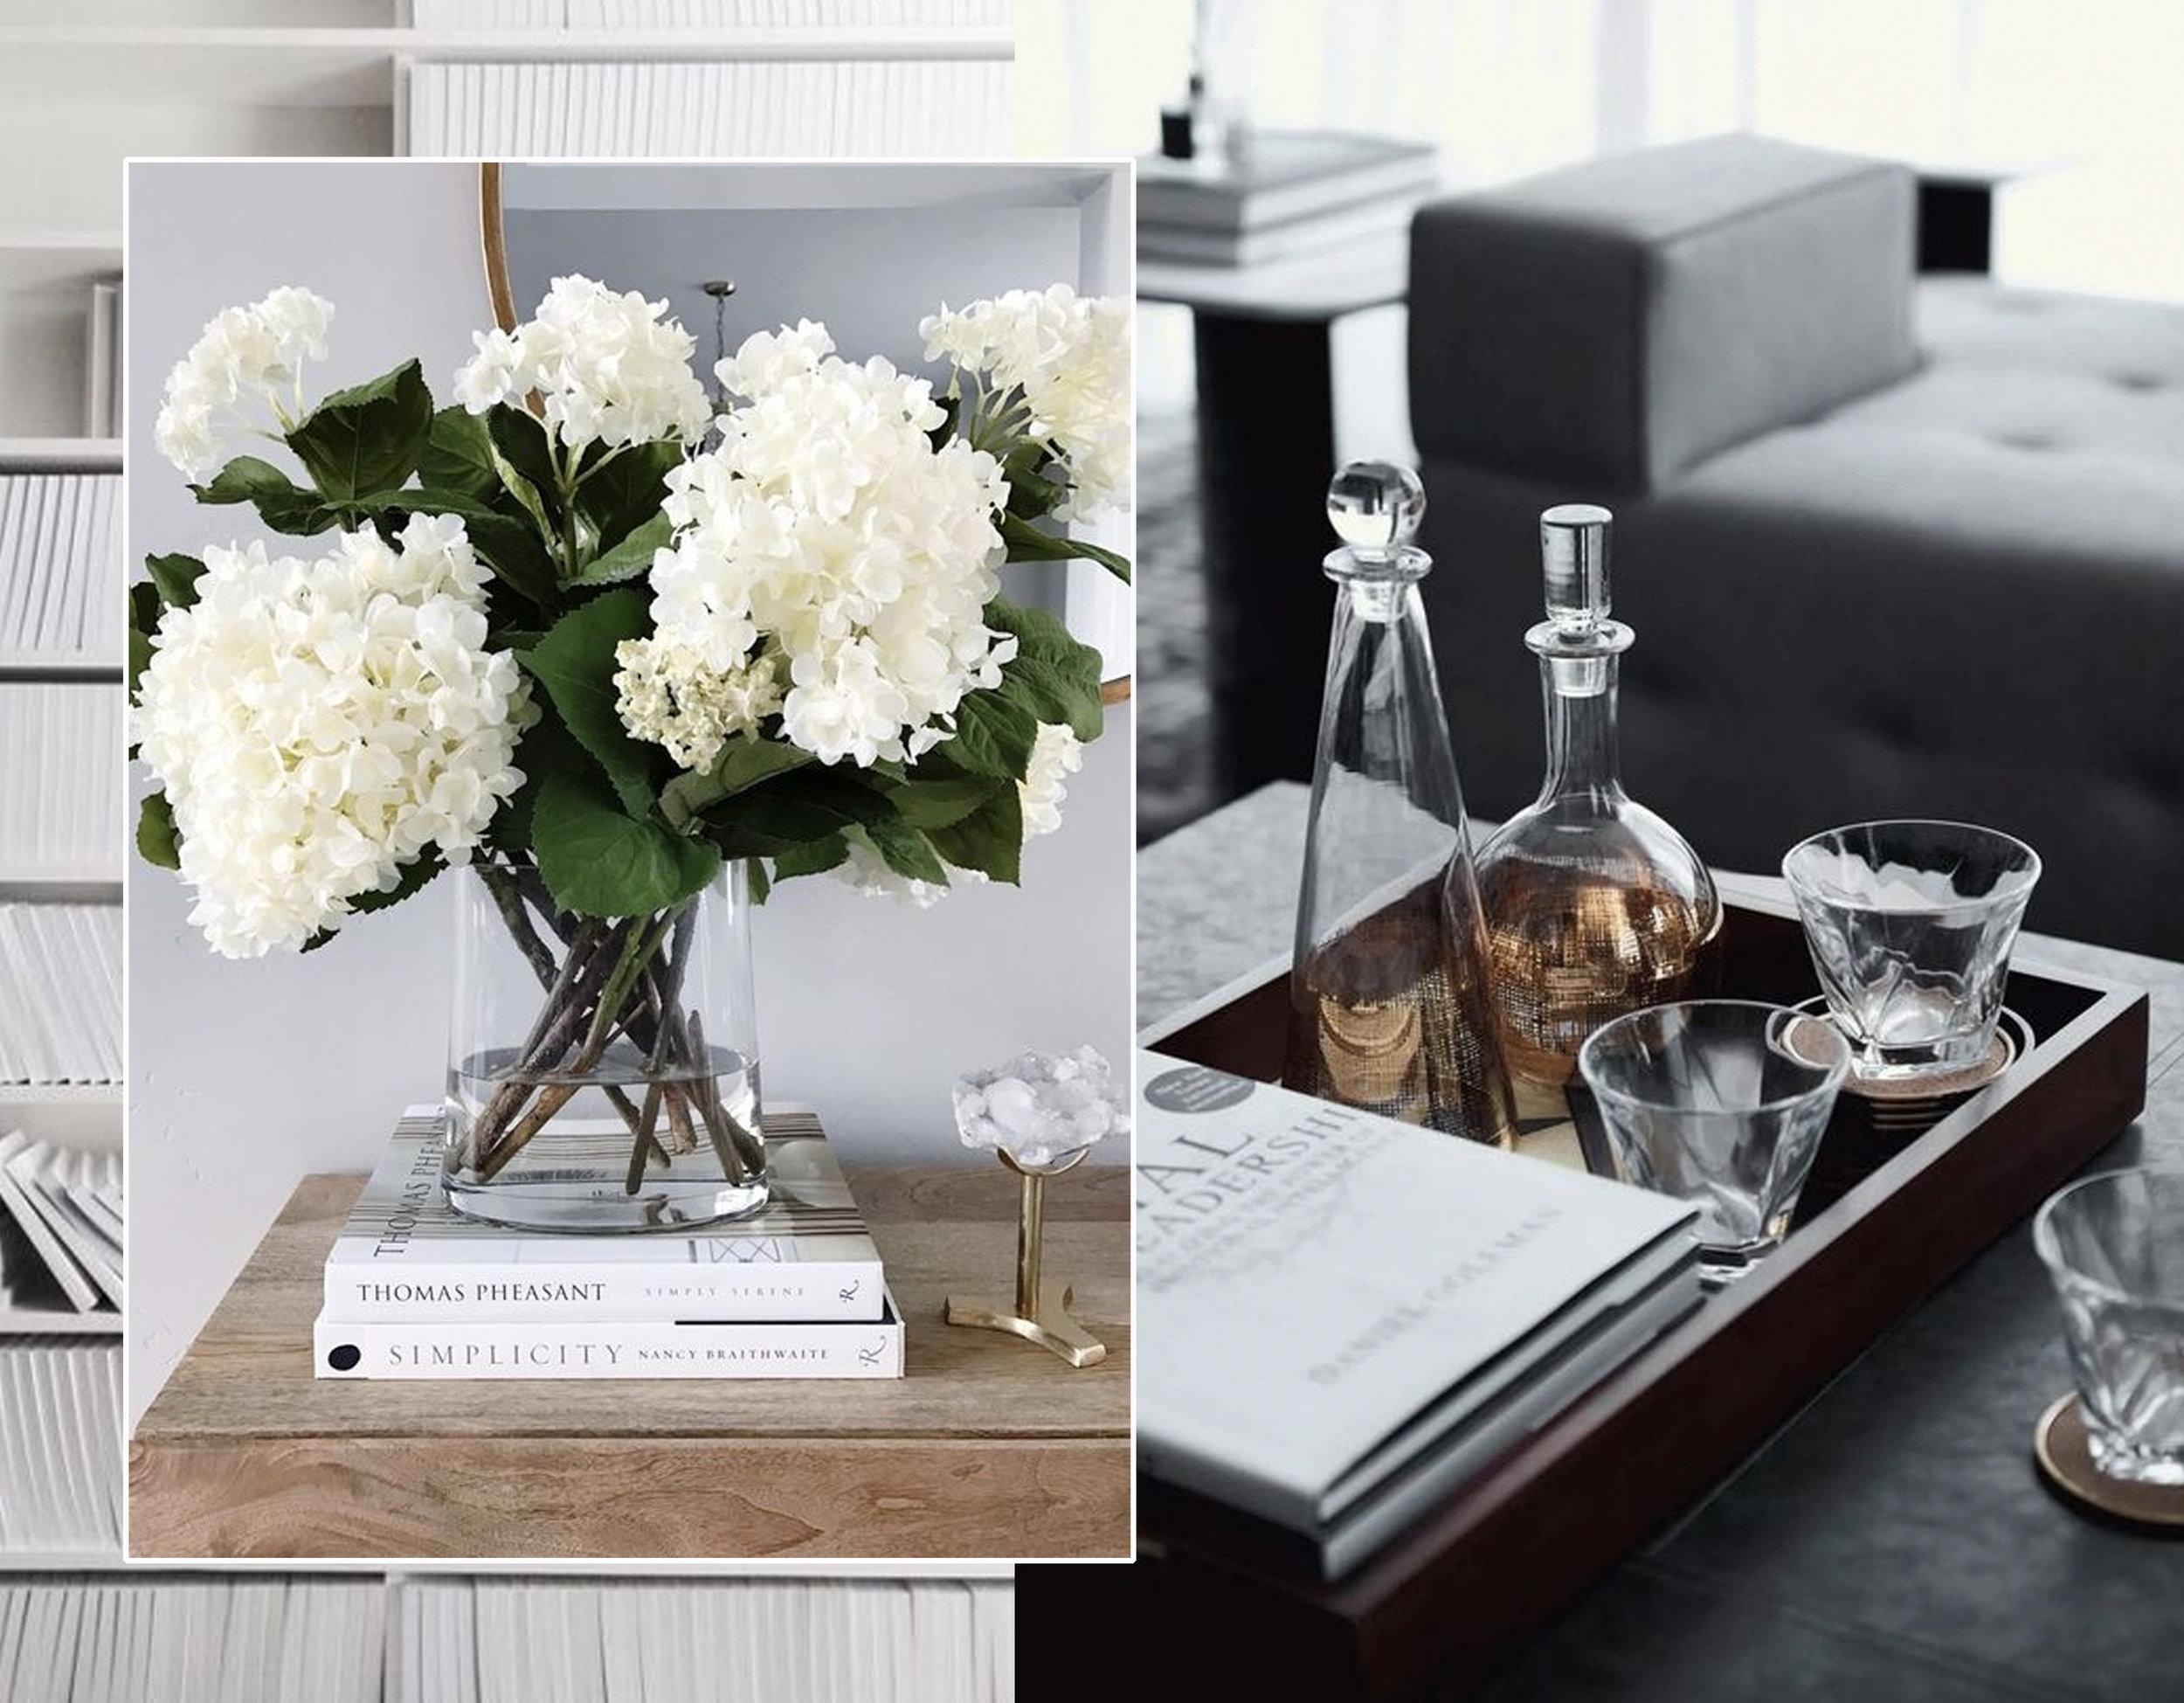 decorating with flowers via  Maison de Cinq  - decorating with carafes via  Hoate